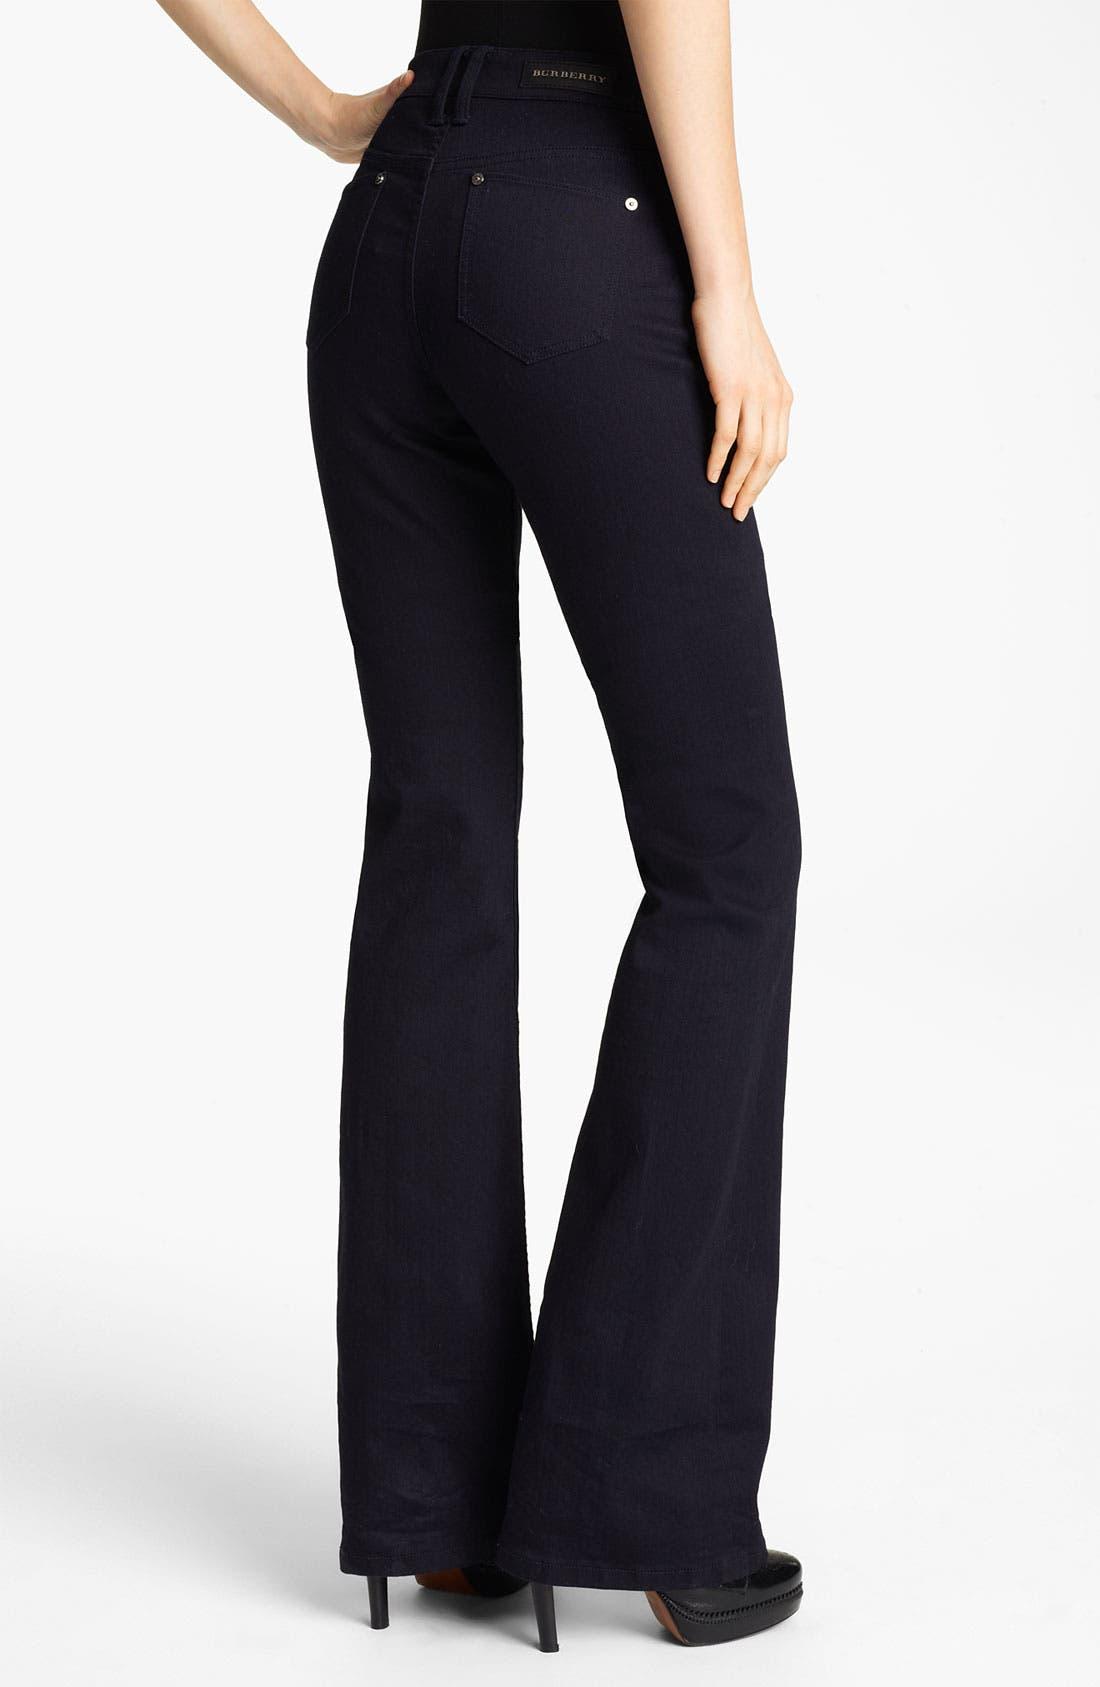 Alternate Image 2  - Burberry London Flare Leg Stretch Jeans